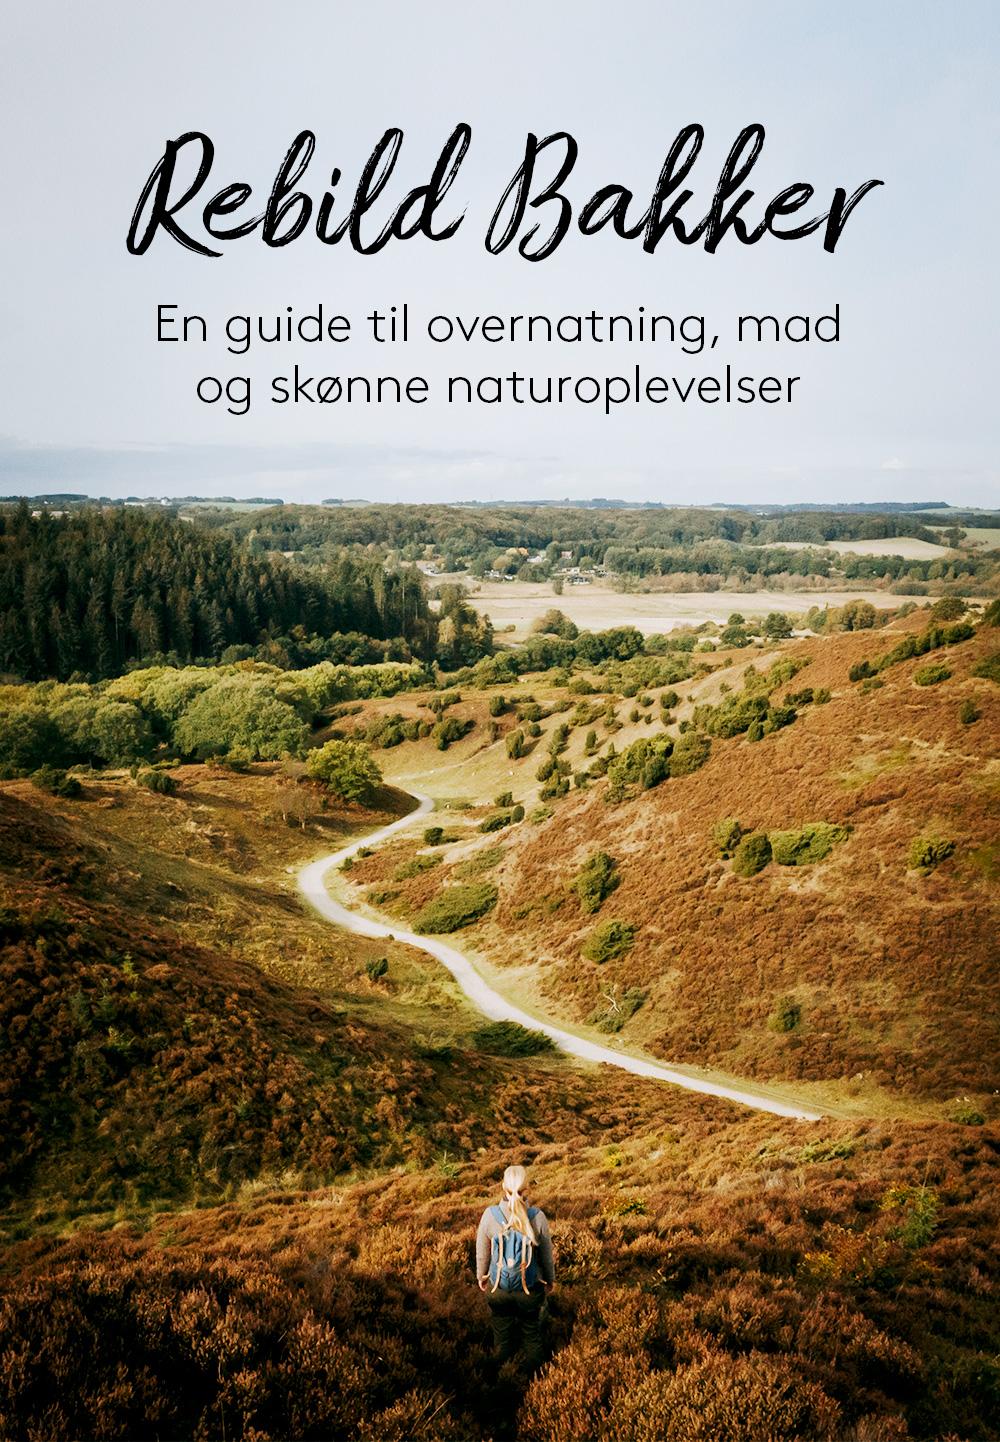 Rebold Bakker guide